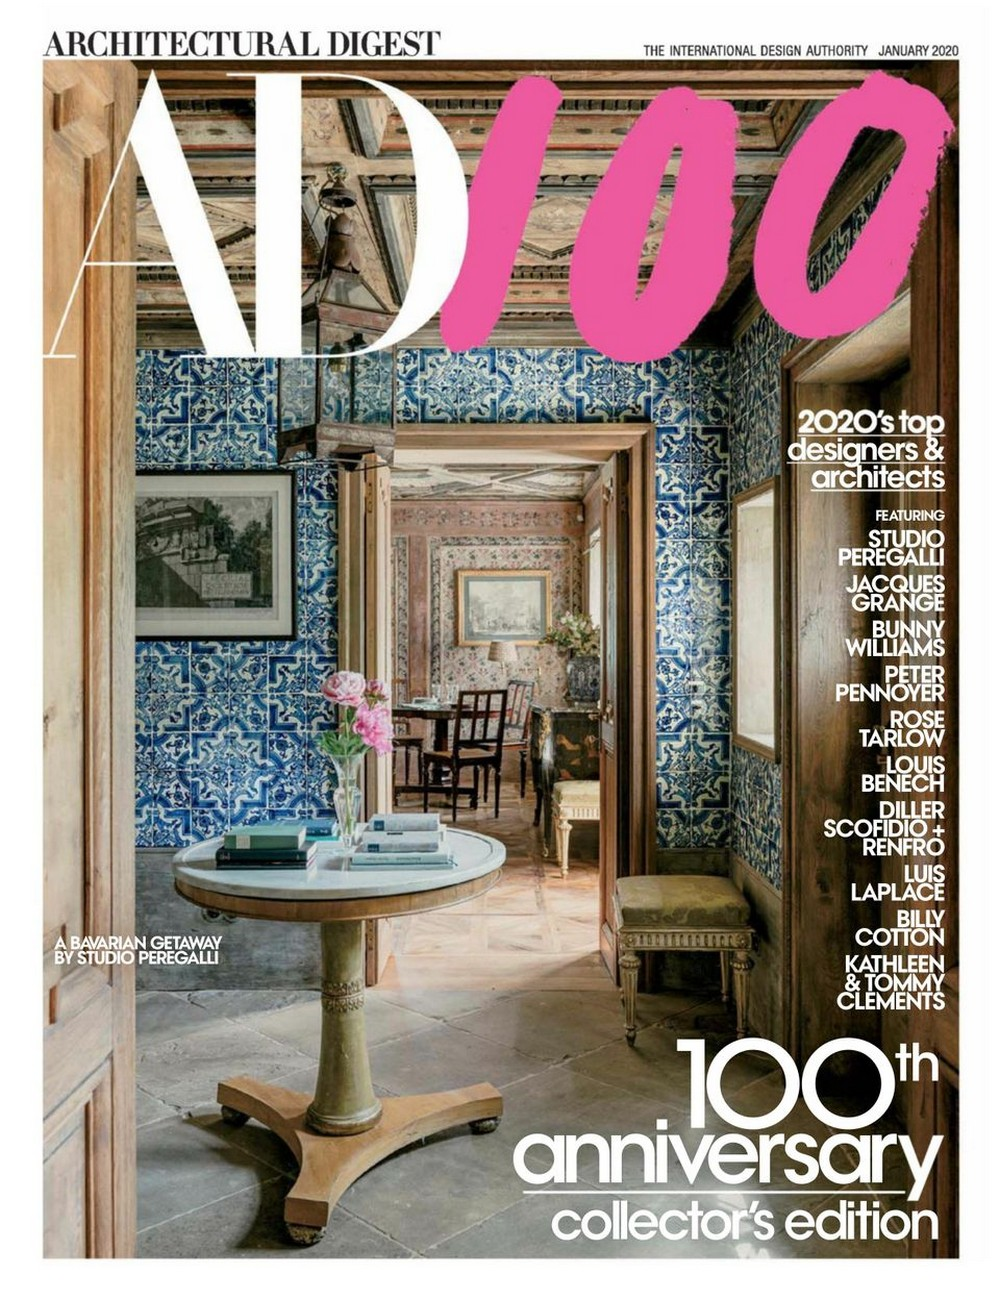 5 Interior Design Magazines You Must Read This Month! interior design 5 Interior Design Magazines You Must Read This Month! 5 Interior Design Magazines You Must Read This Month 4